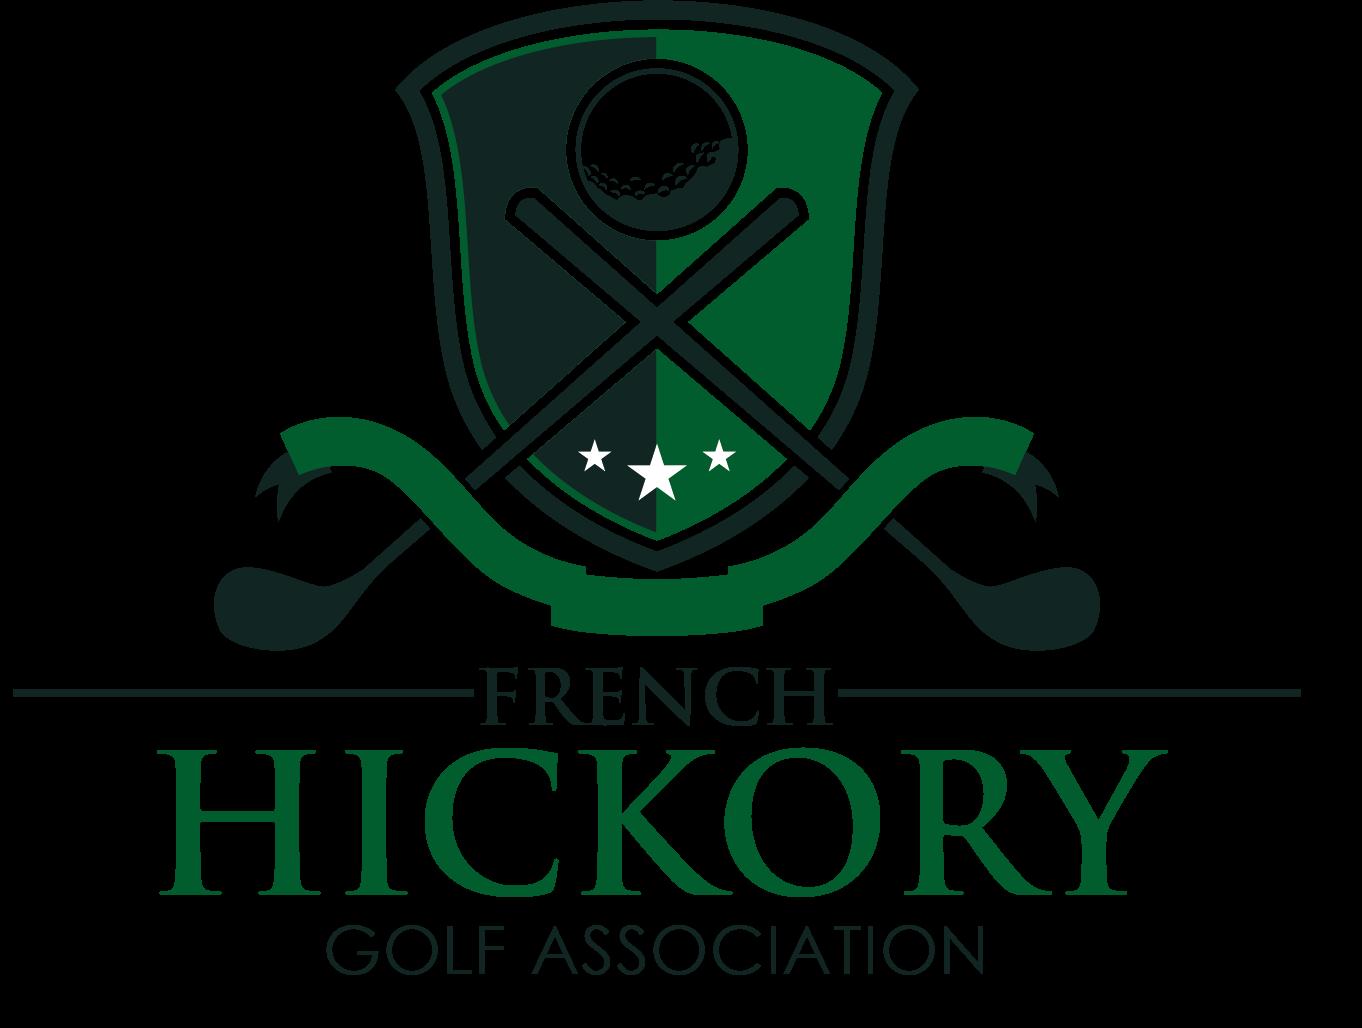 French Hickory Golf Association